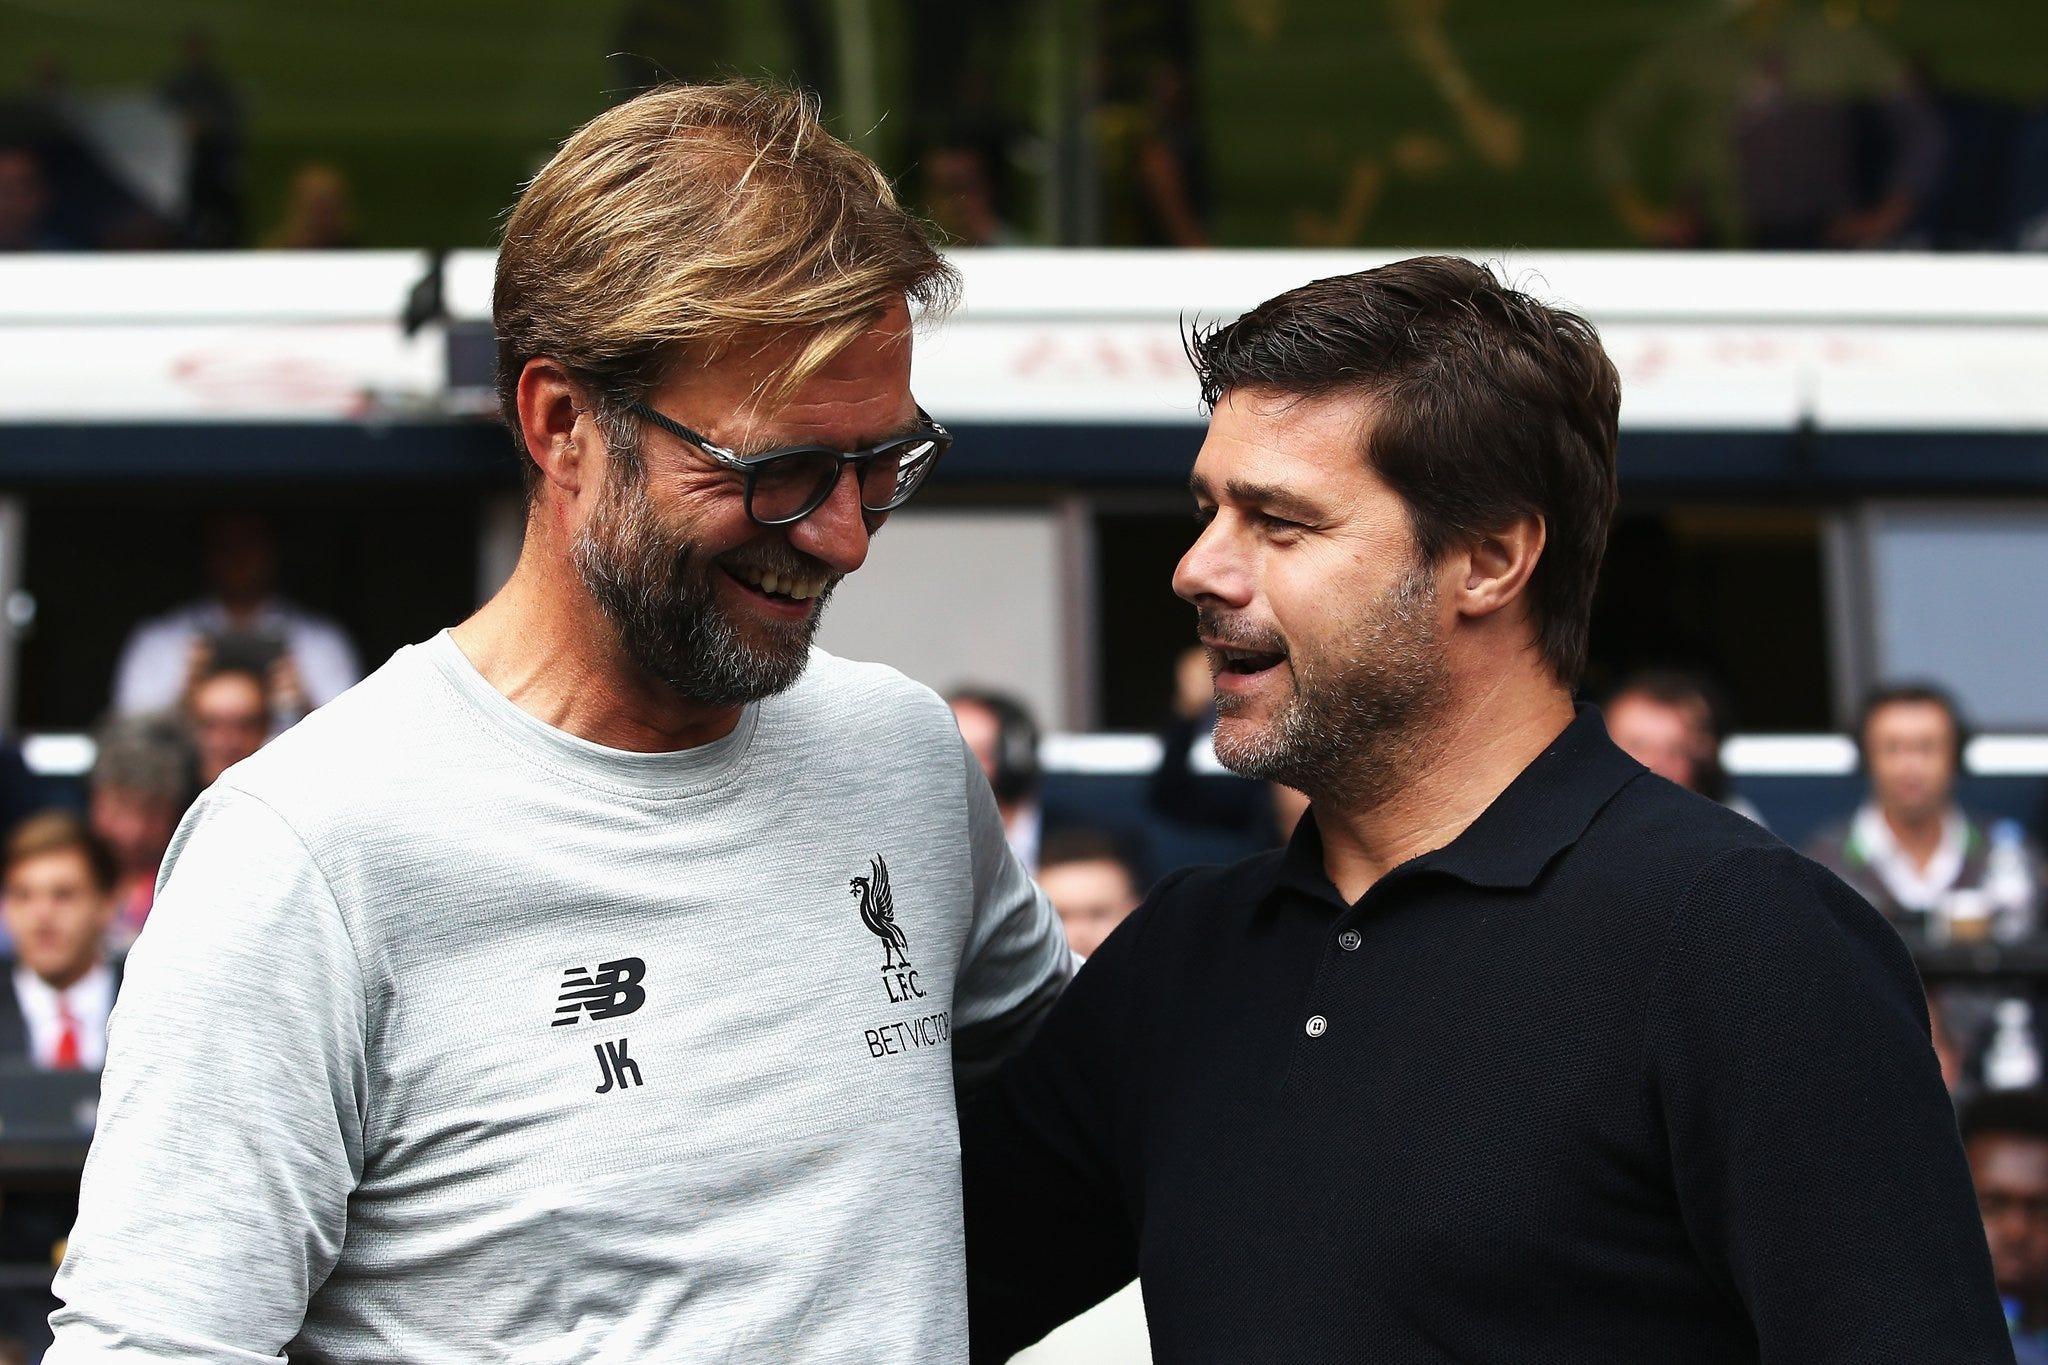 new product debc6 6c9de The Lost Superstars of Liverpool and Tottenham